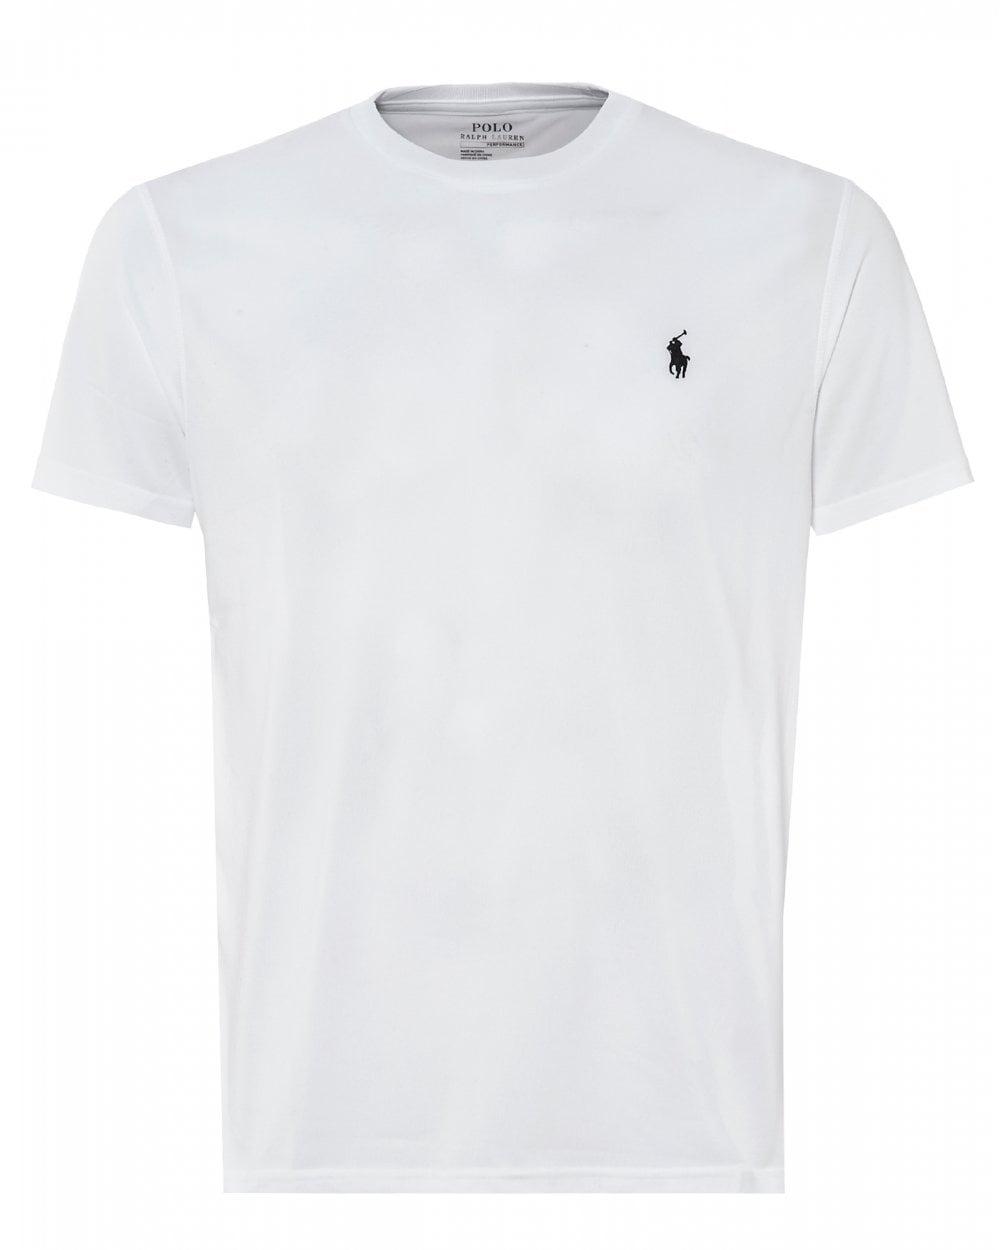 f85eb9ff4 Ralph Lauren Mens Polo Player T-Shirt, White Slim Fit Tee